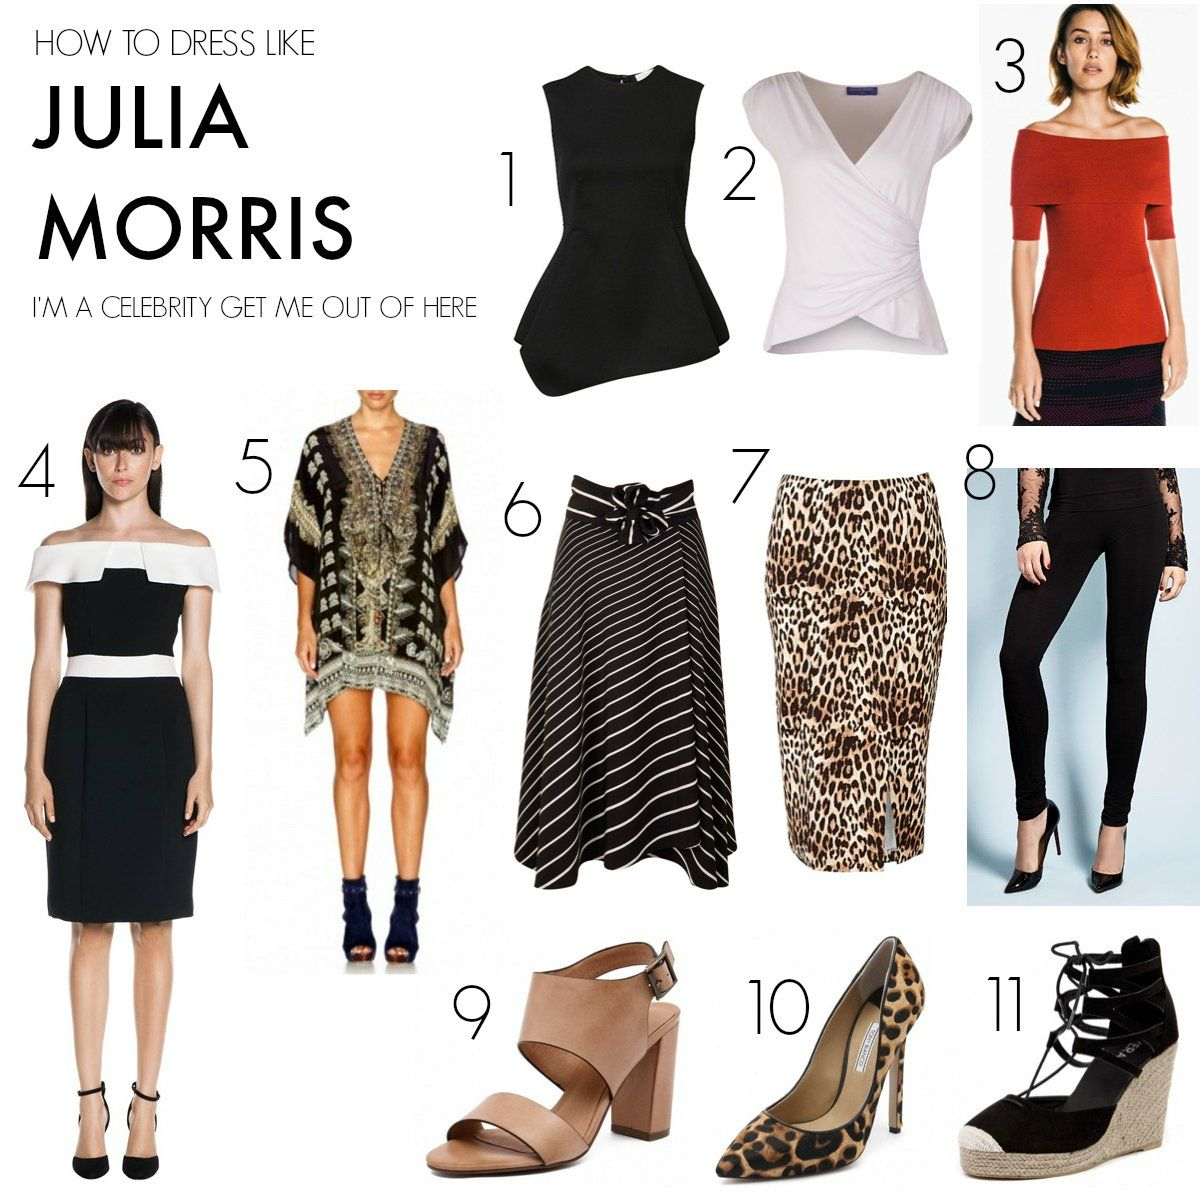 cb2b85193b9 How to get Julia Morris' wardrobe | Celebrity style | Julia morris ...